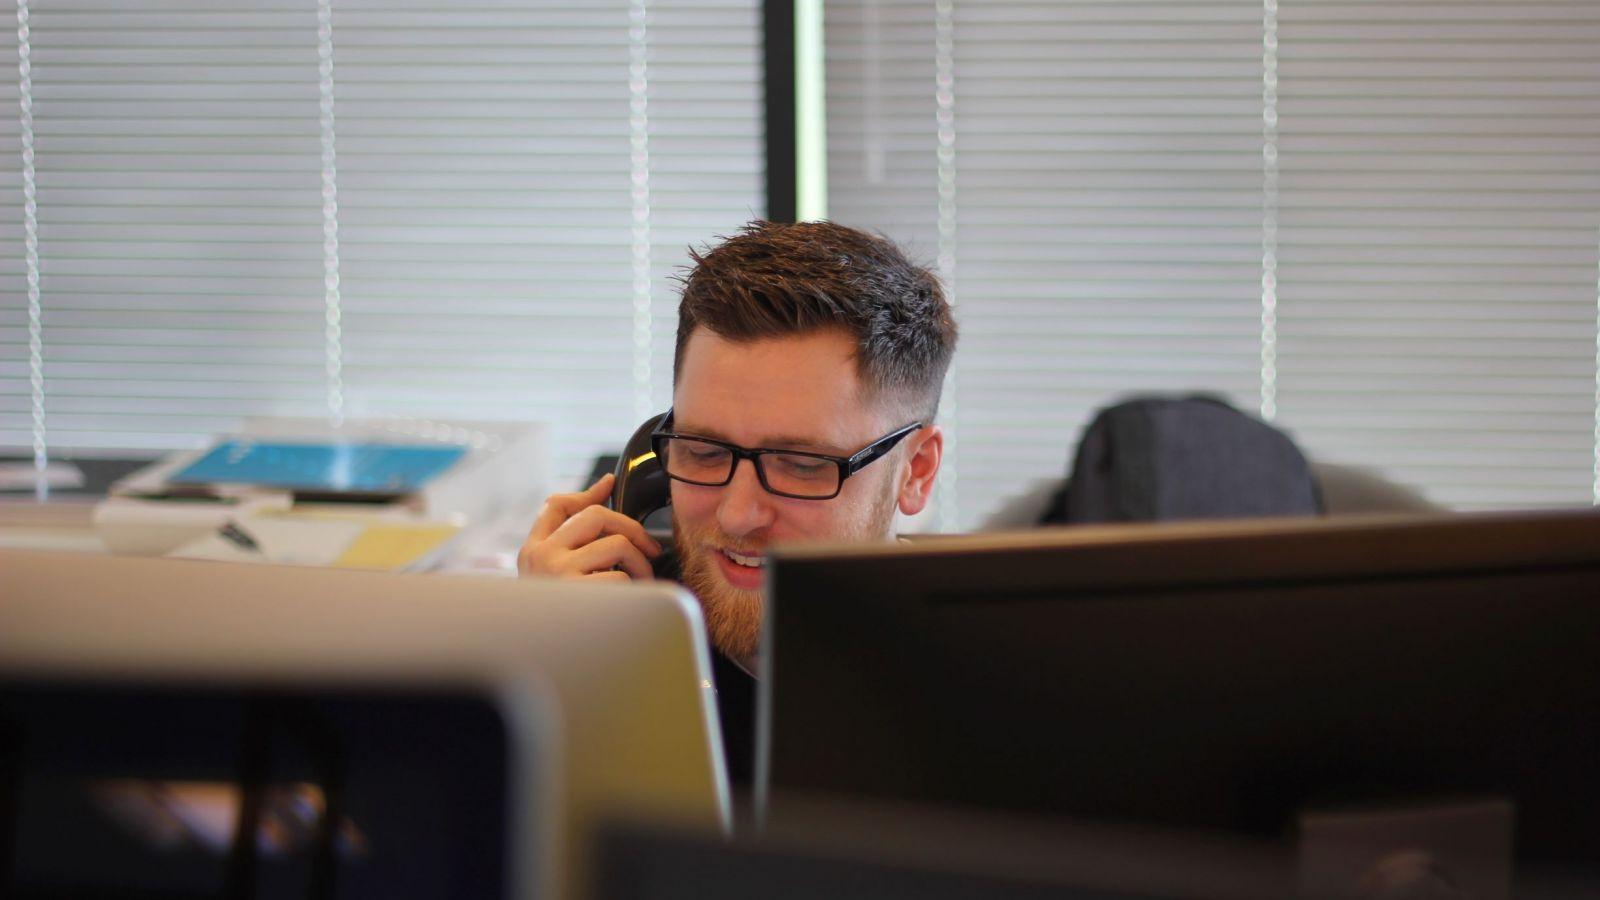 General Call Center Quality Assurance Form